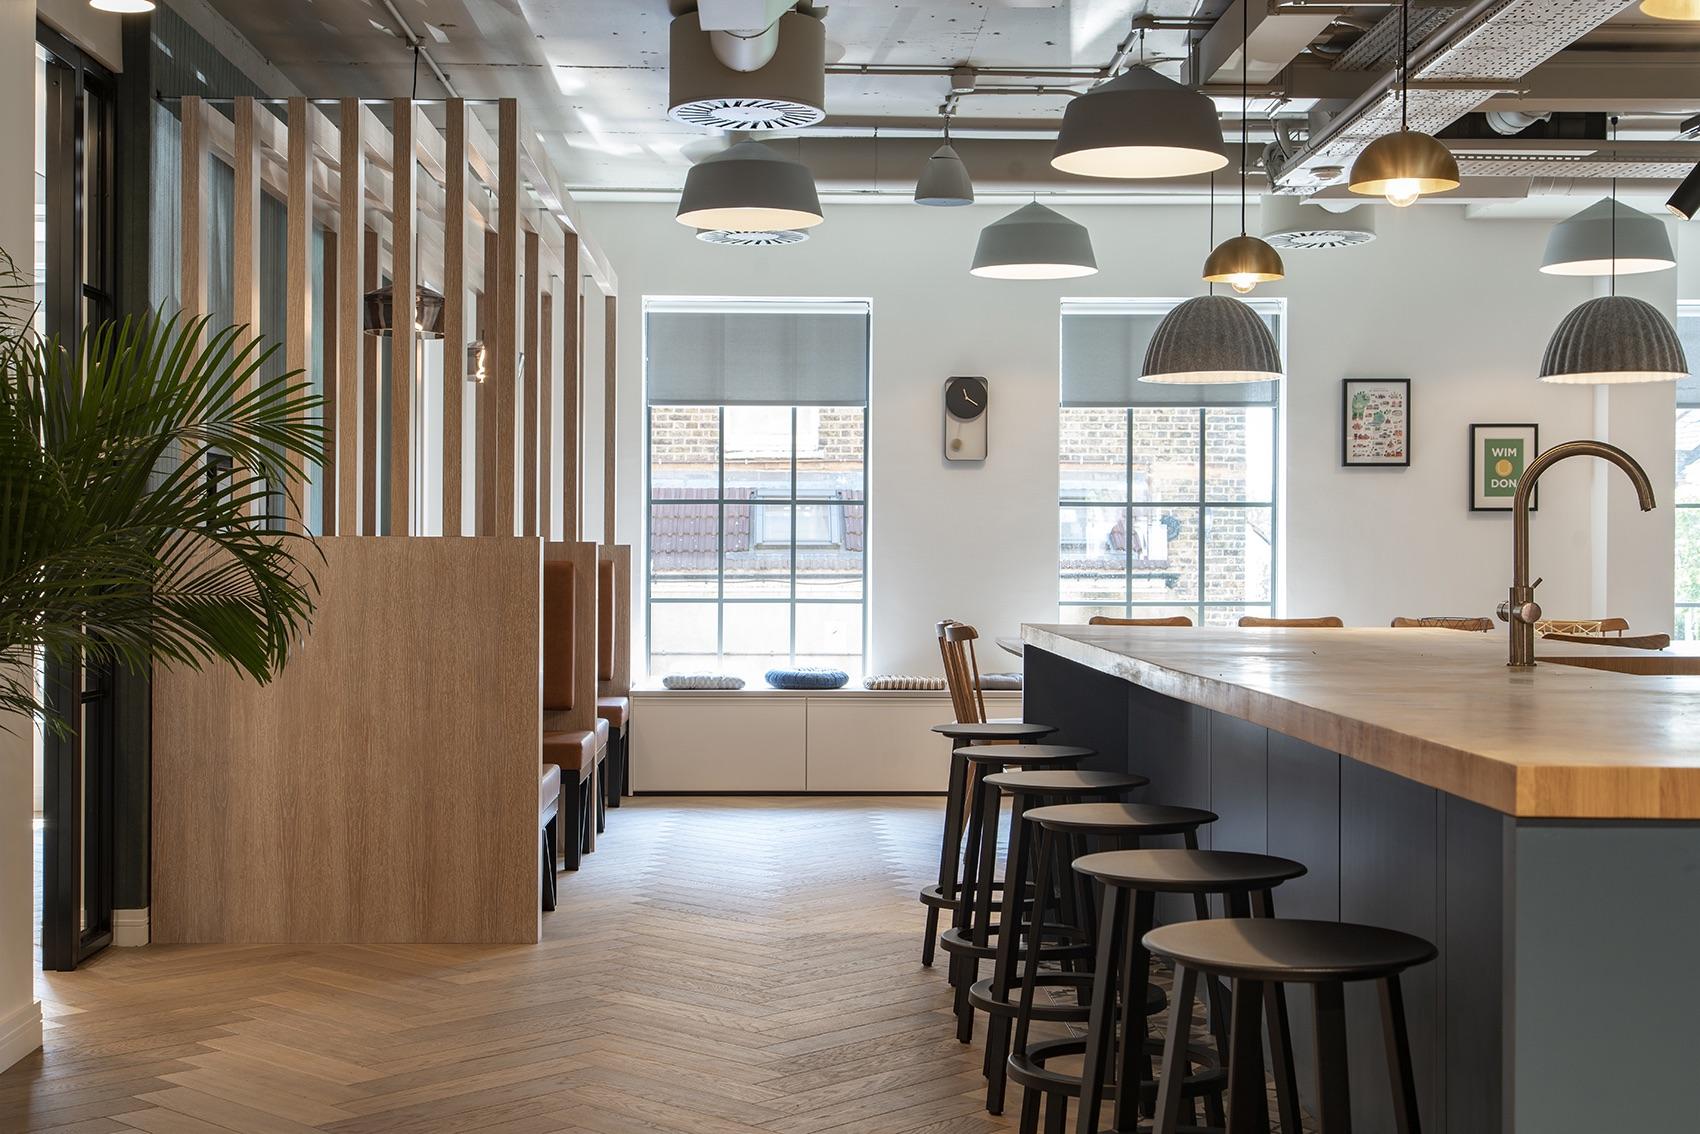 peldon-rose-new-office-london-4